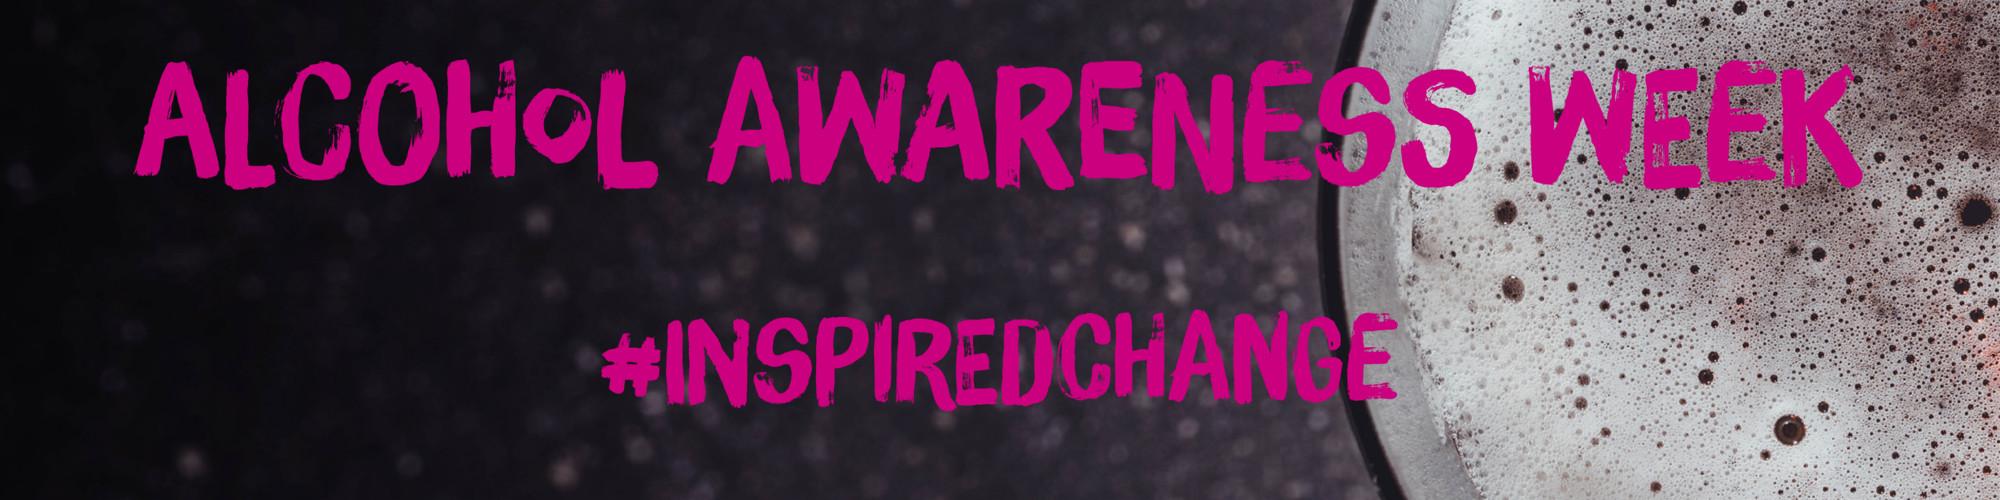 Alcohol Awareness Week Banner image